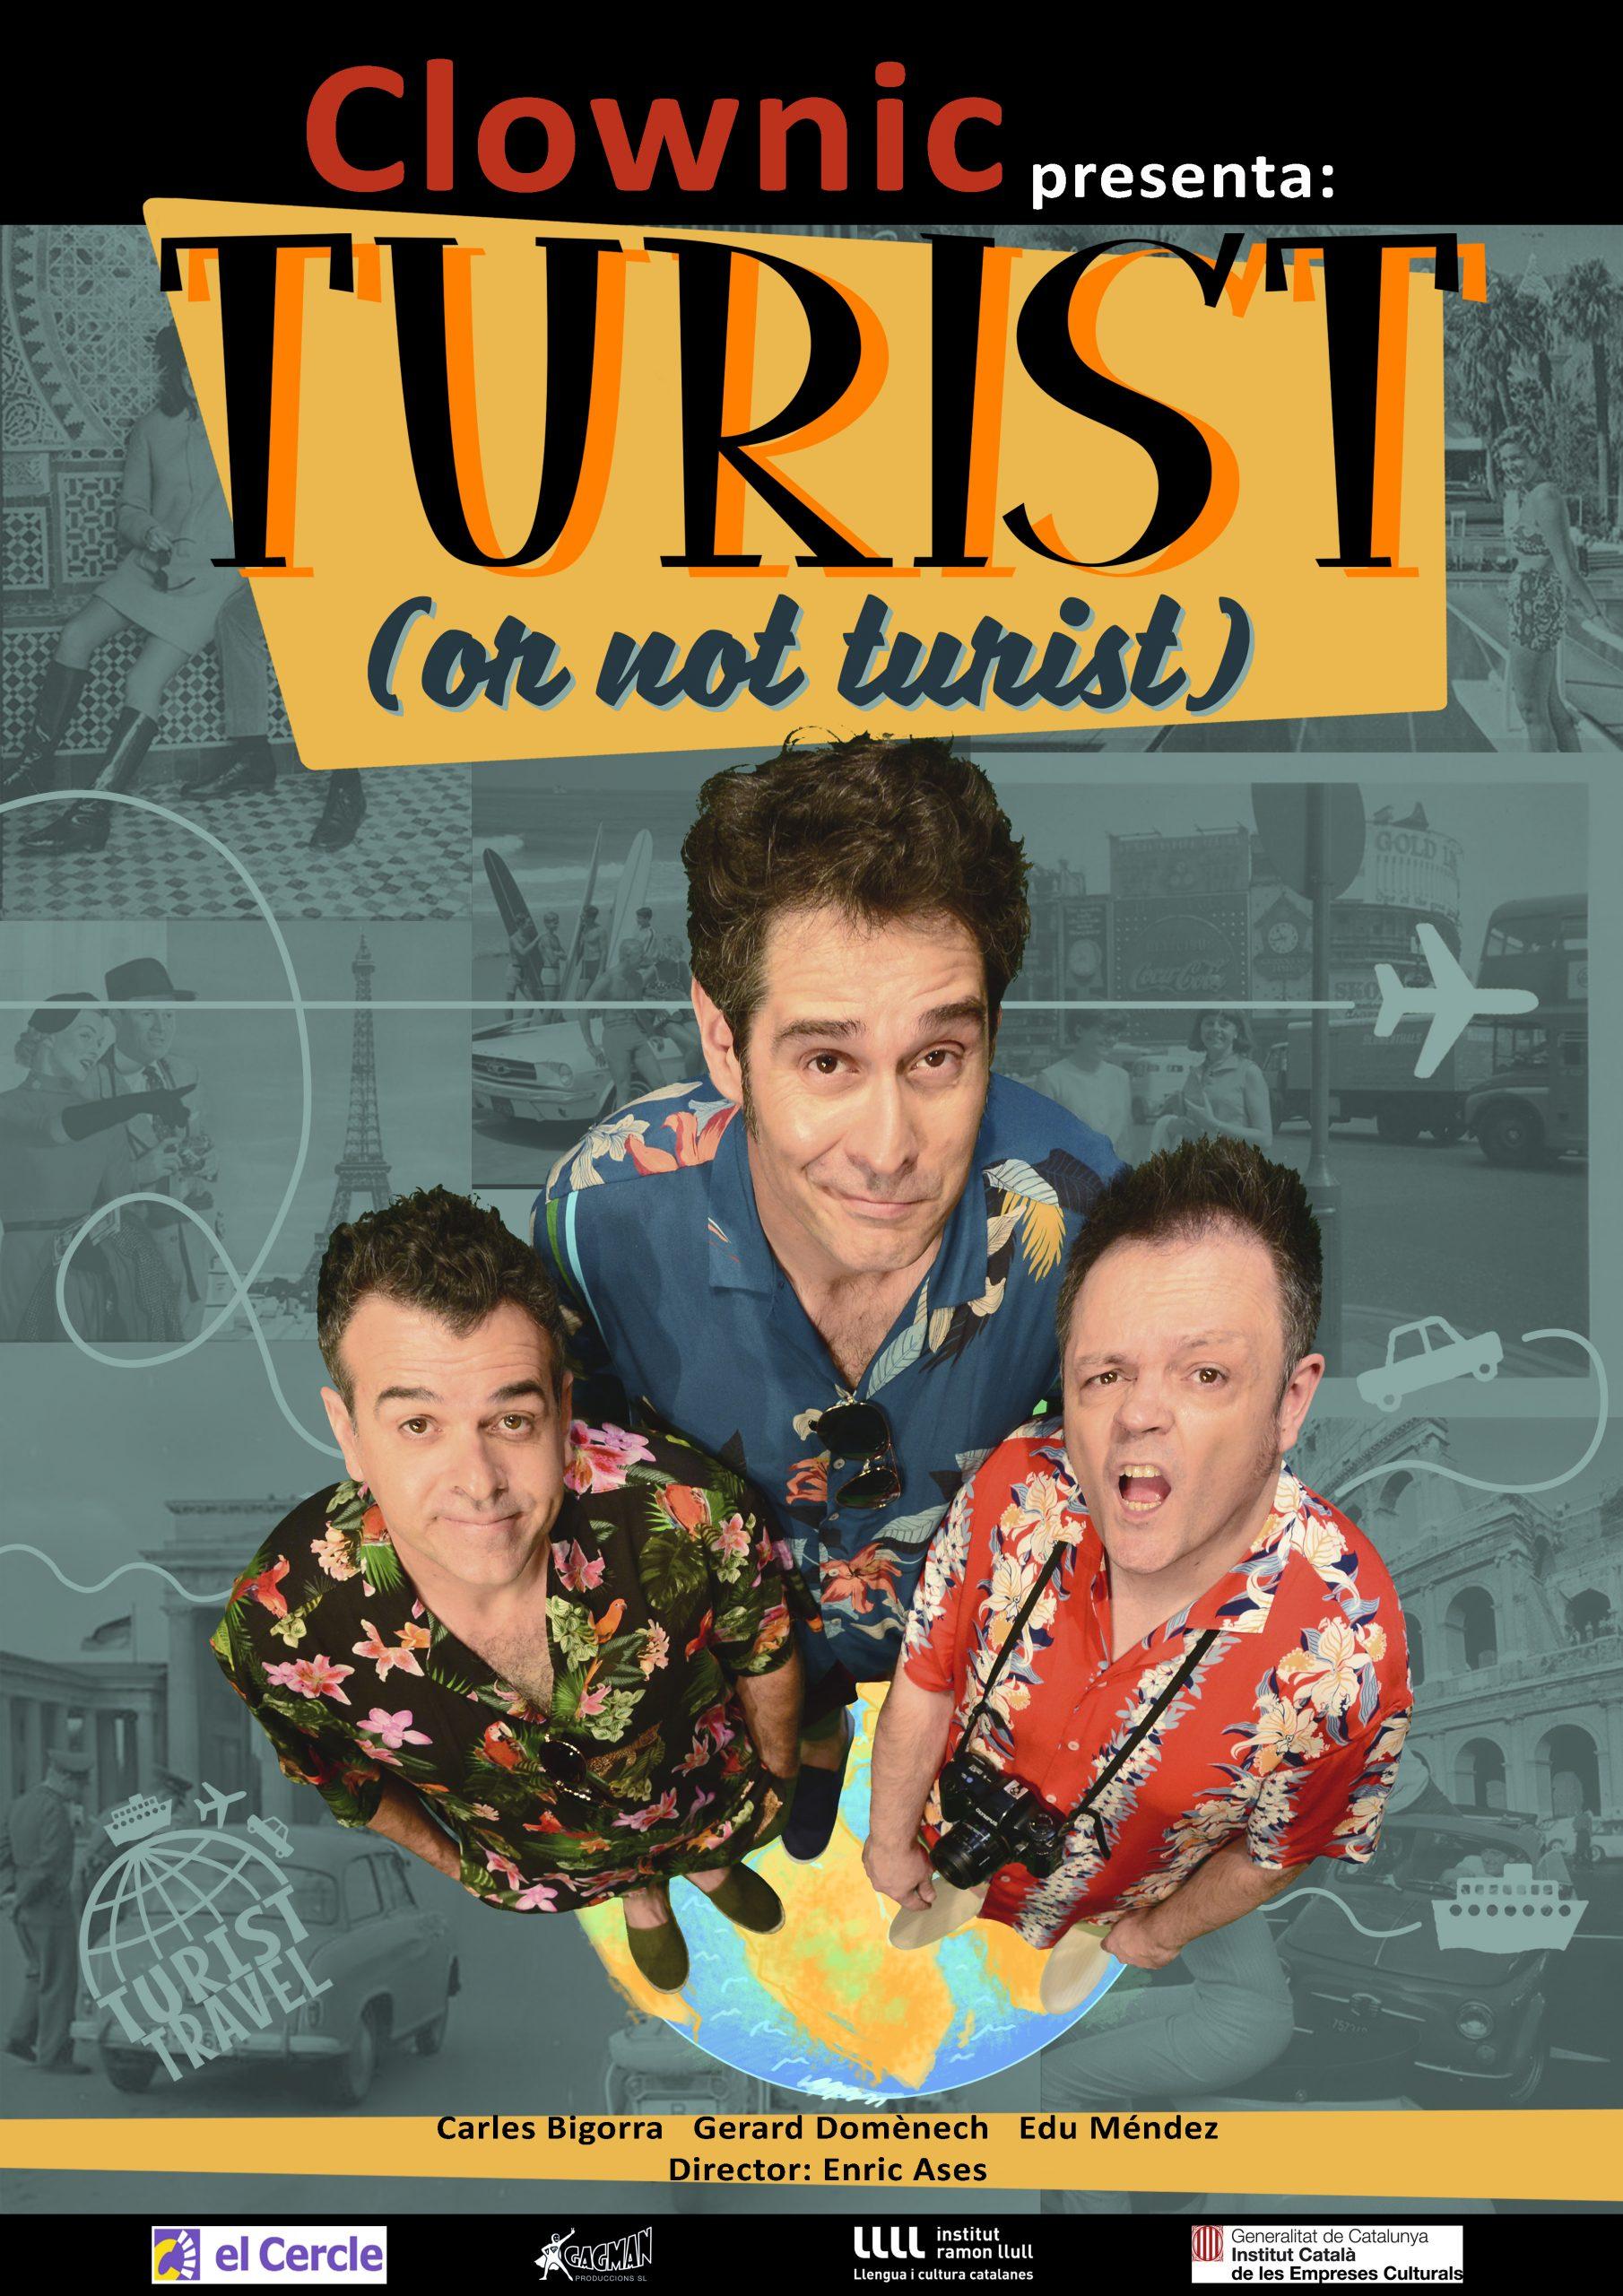 Turist (or not turist)